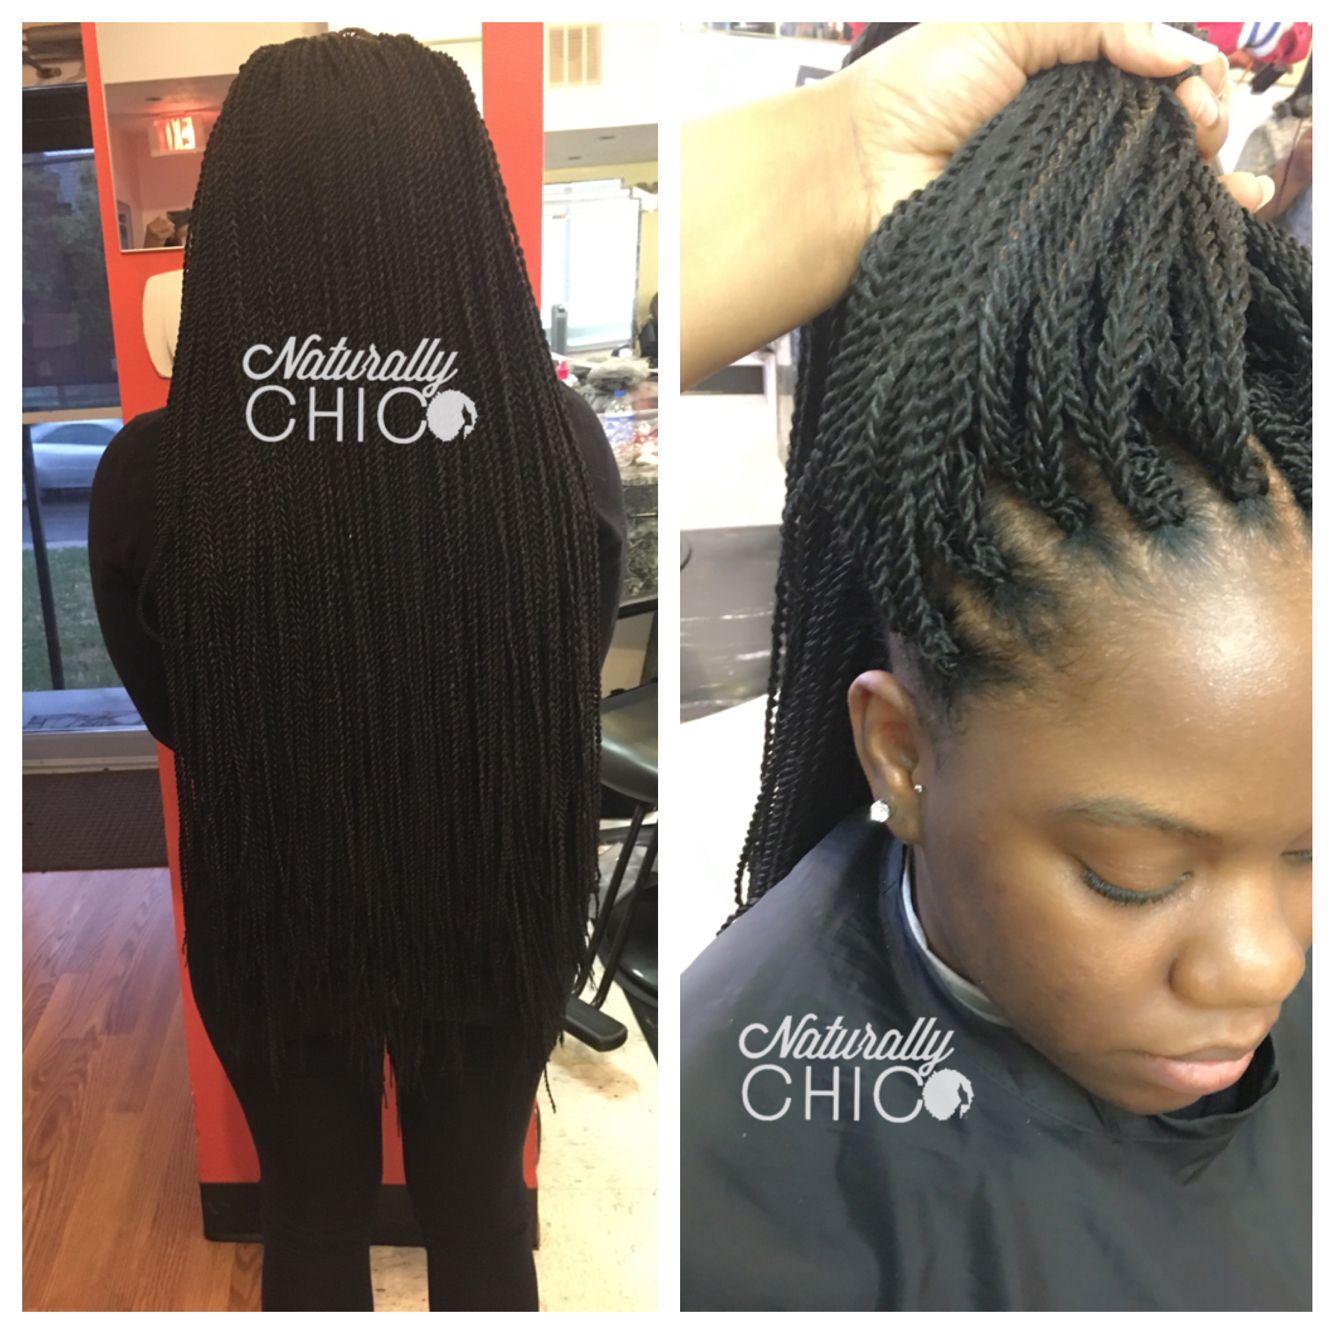 Crochet Braids Hair Used Freetress Super Long Senegalese Twist 30 Www Iamnaturallychic Naturallychic